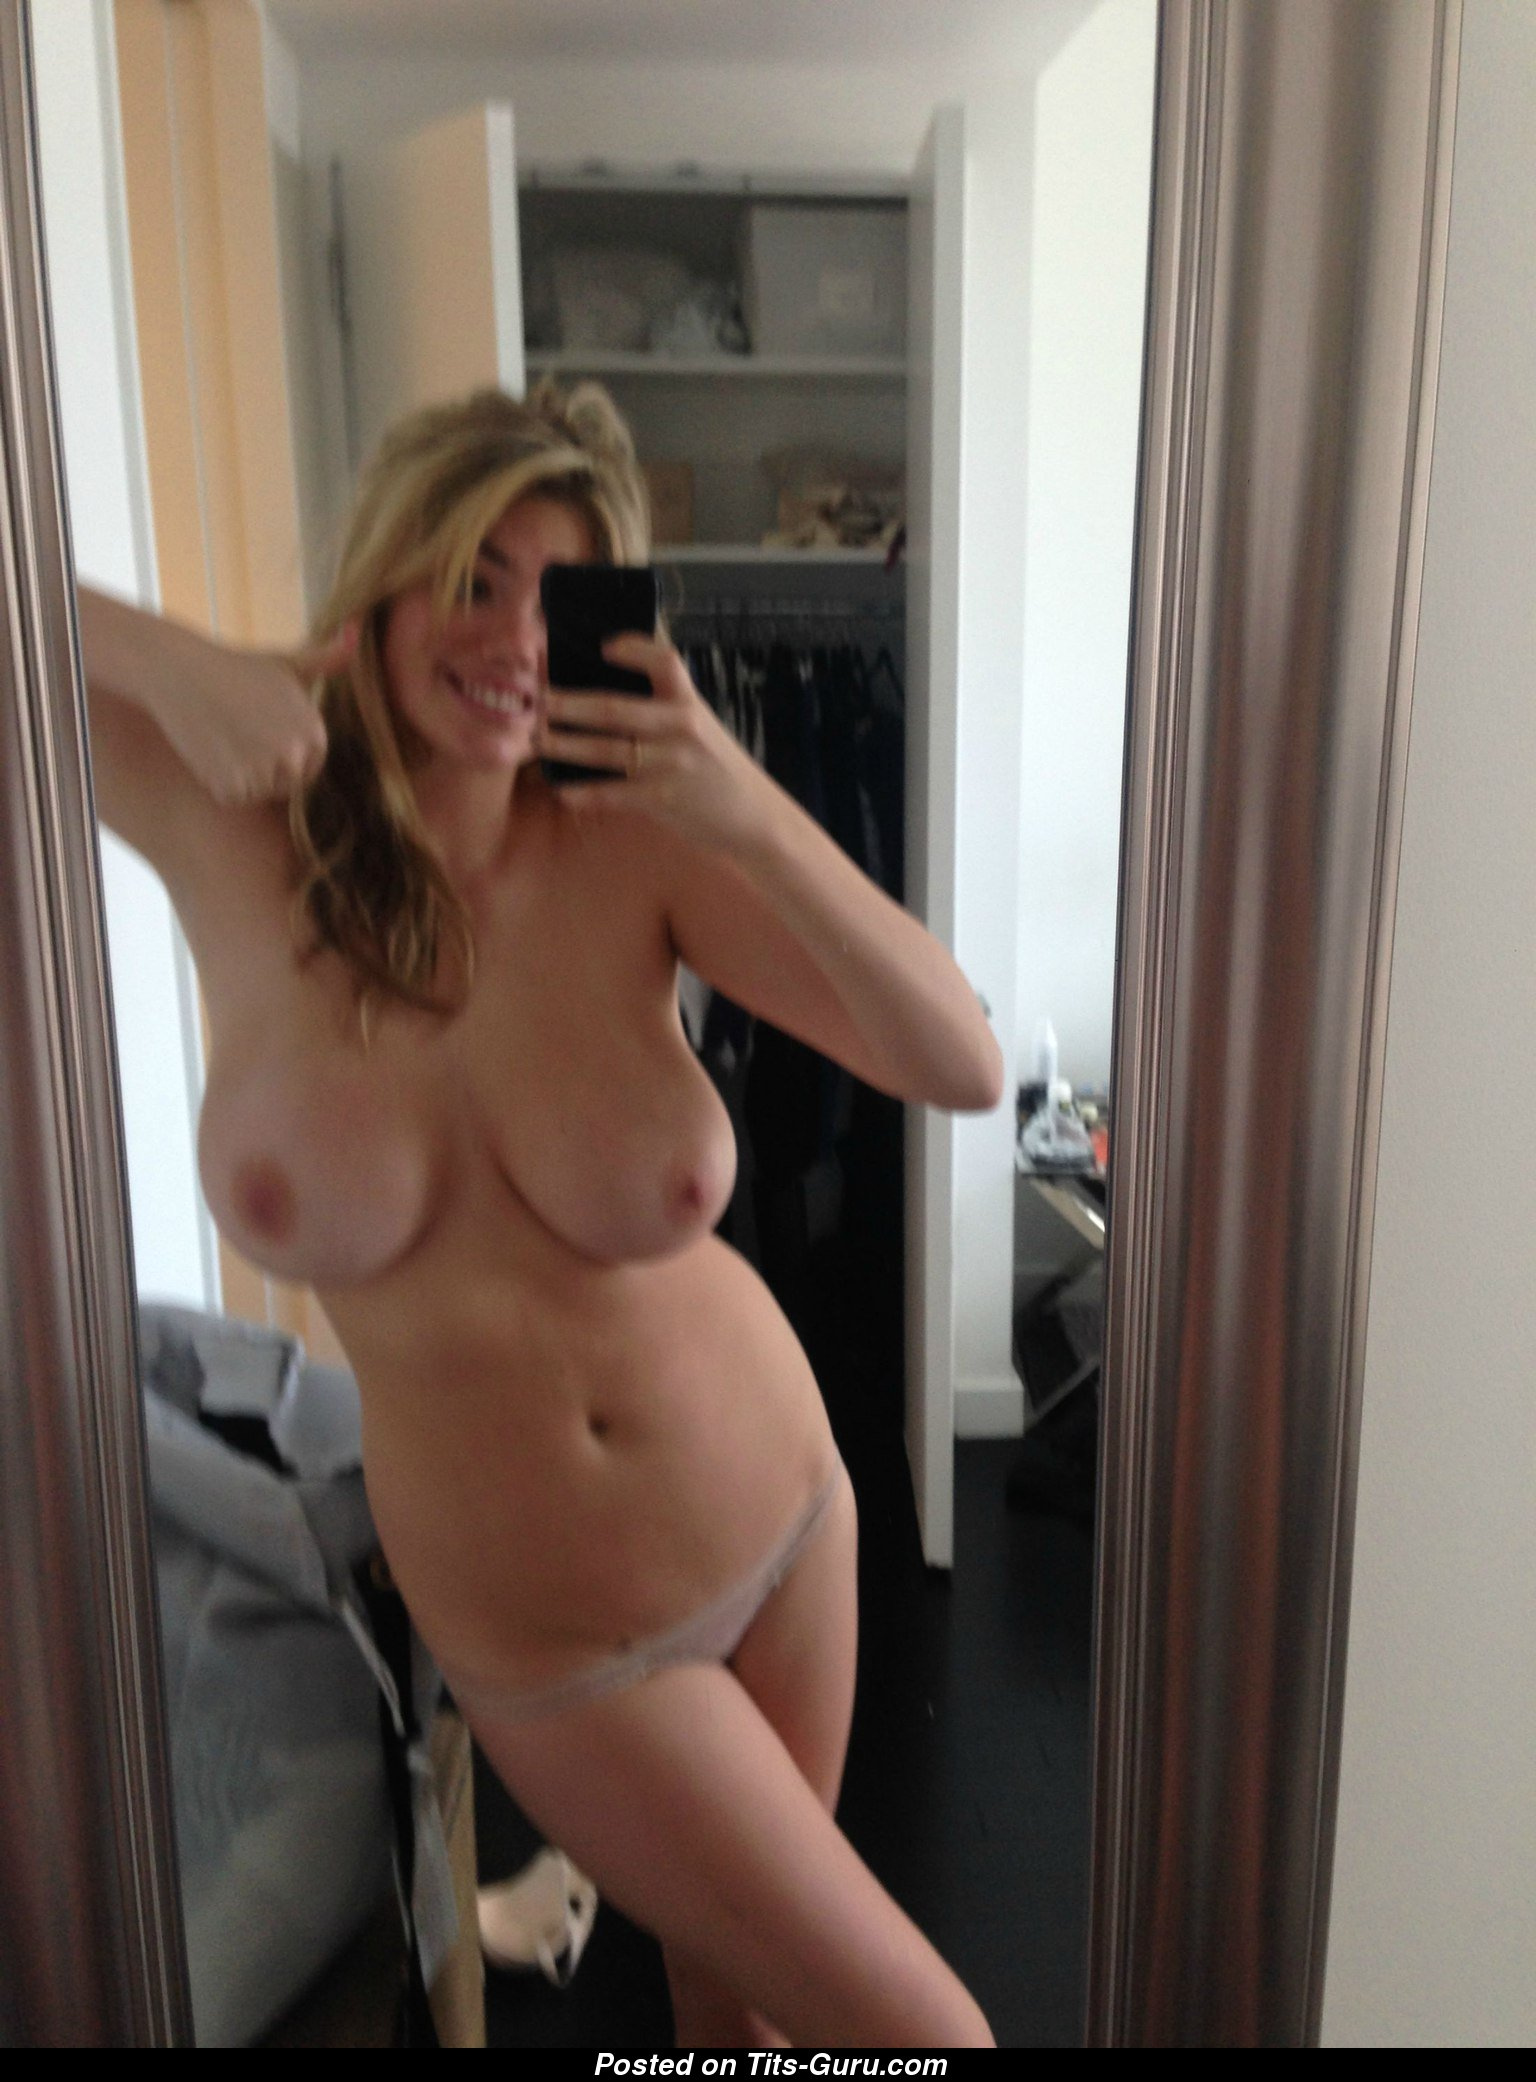 Kate Uptons Tits photo 1